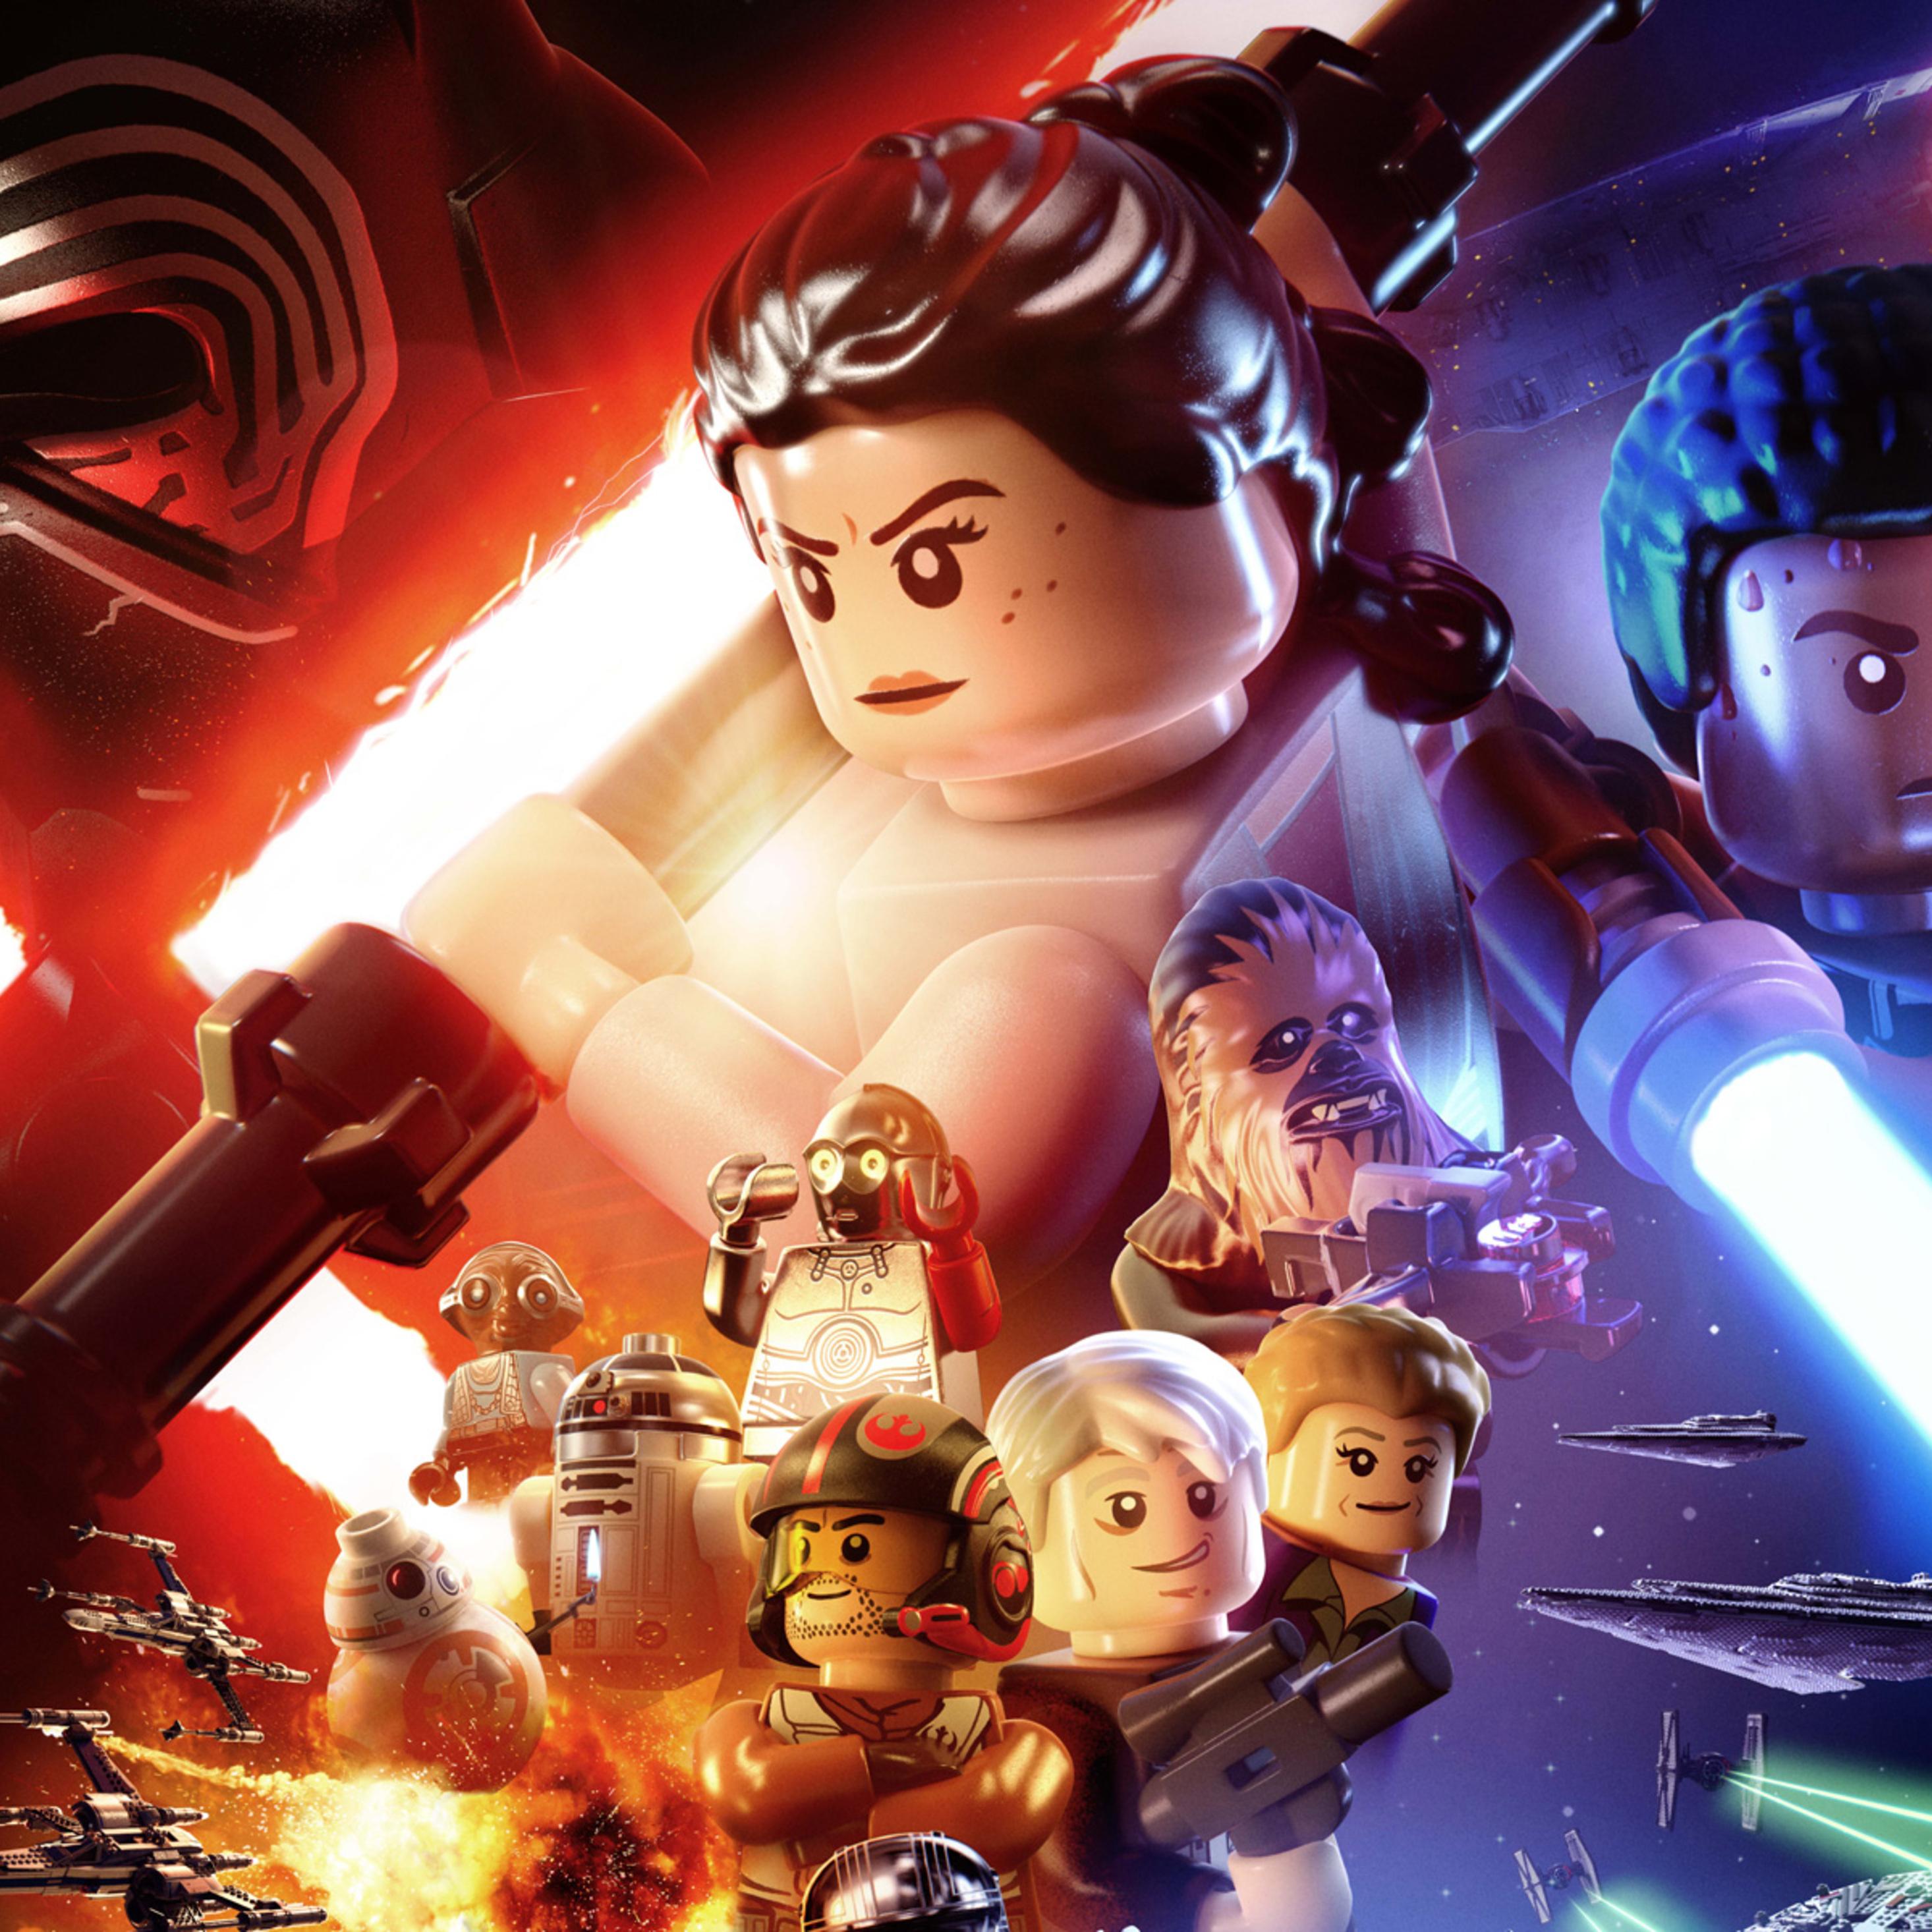 2932x2932 Lego Star Wars The Force Awakens Ipad Pro Retina Display